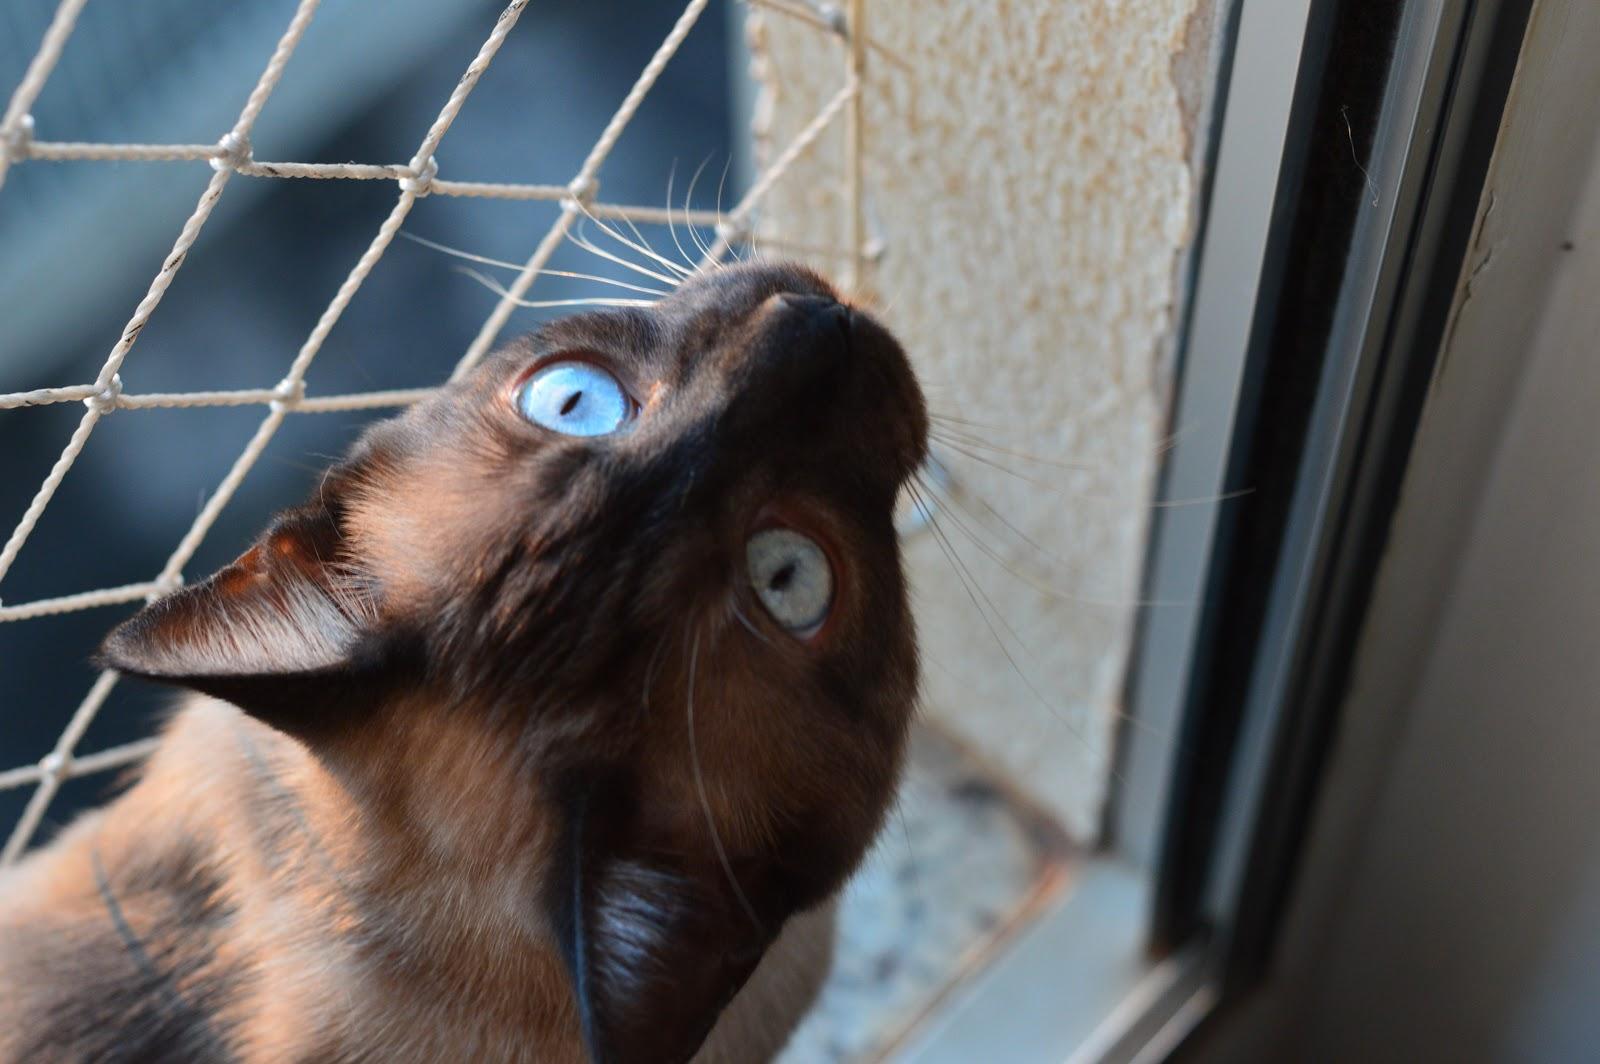 Projeto fotográfico 7 on 7: Gatos fofinhos